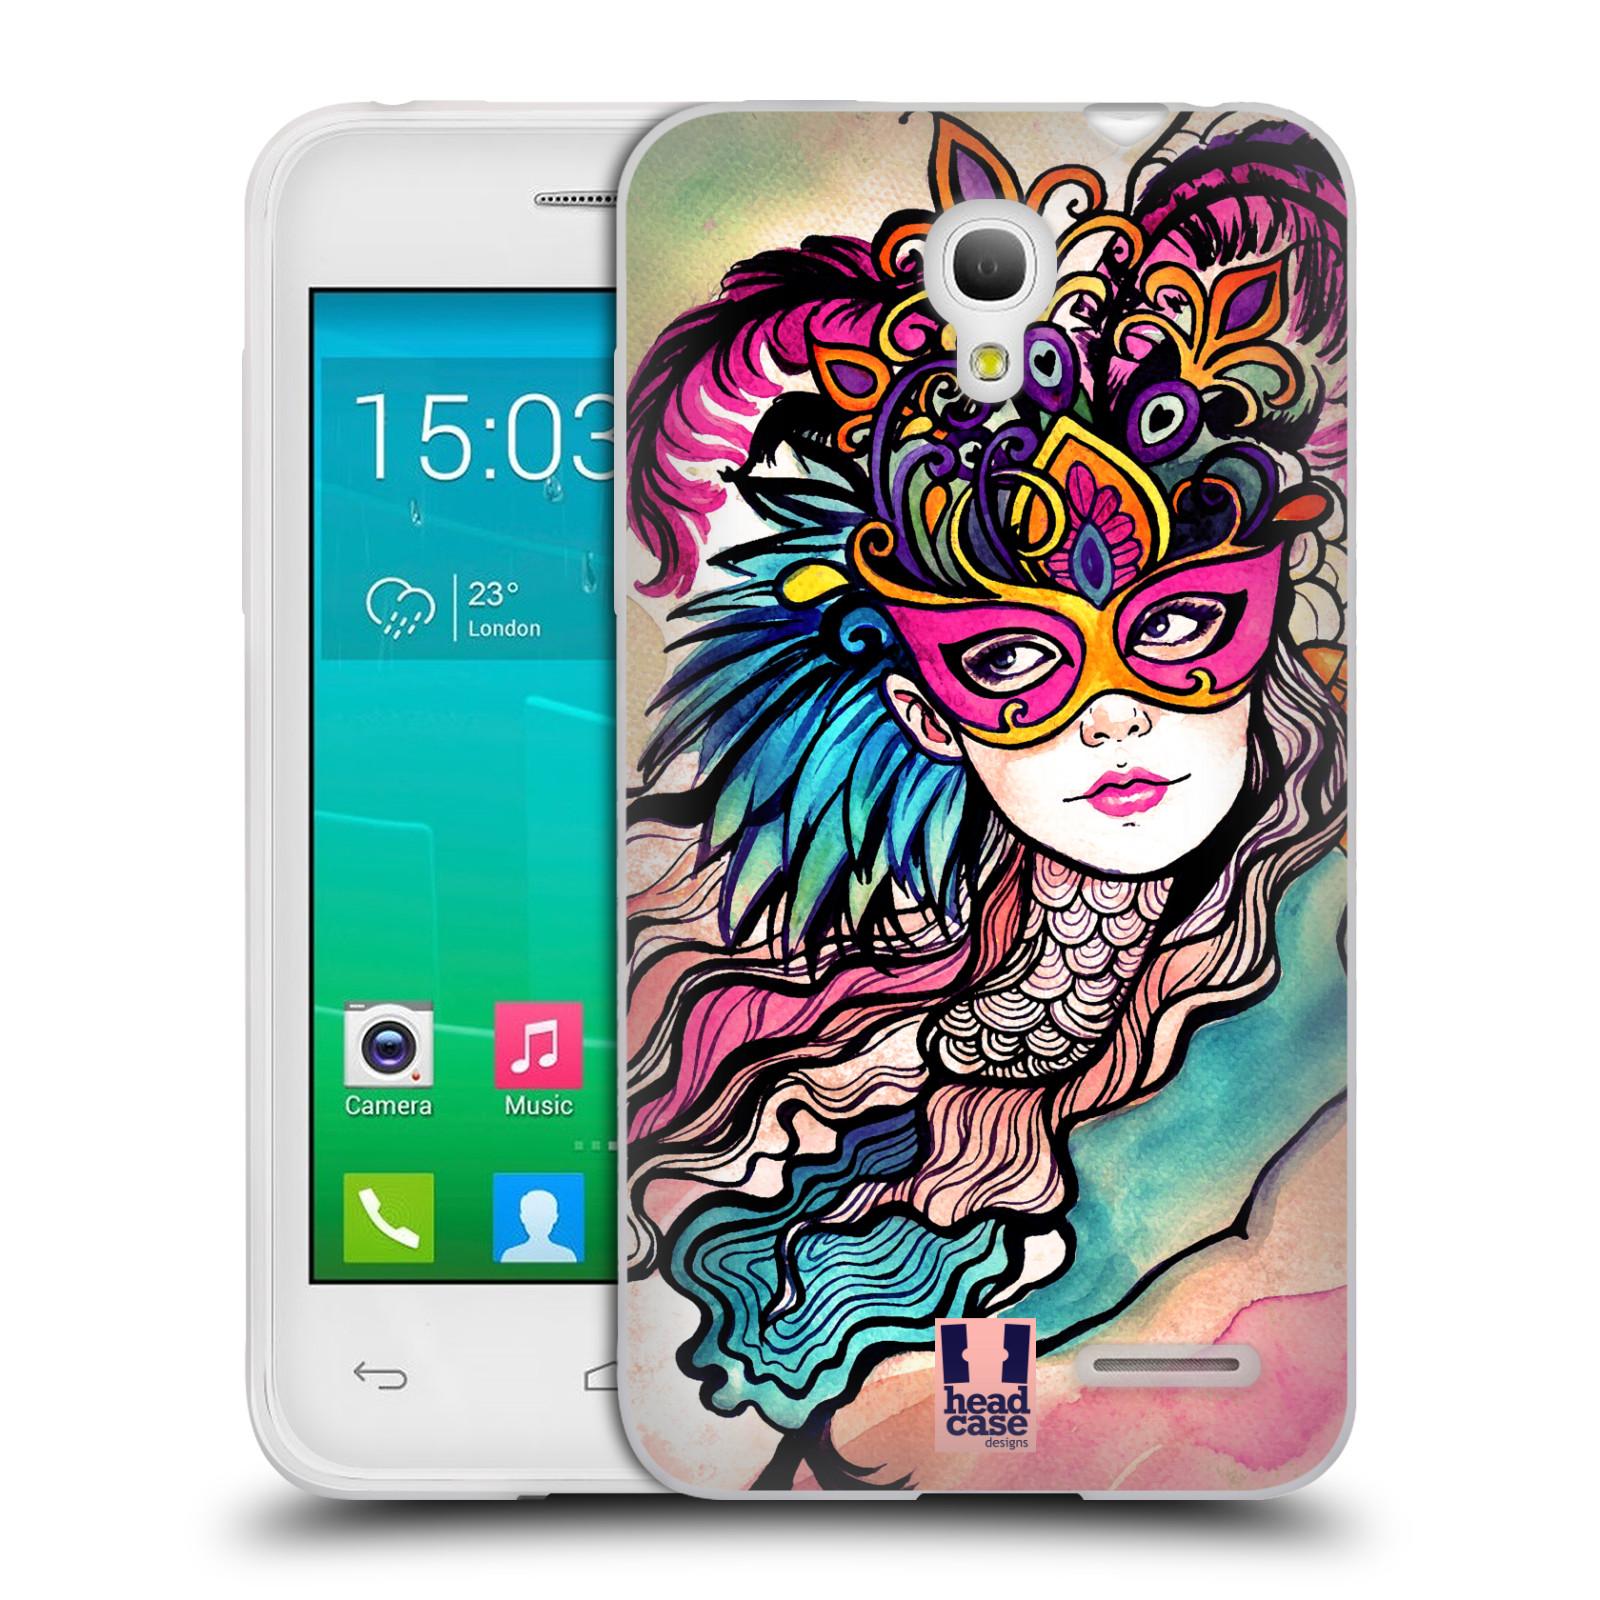 HEAD CASE silikonový obal na mobil Alcatel POP S3 OT-5050Y vzor Maškarní ples masky kreslené vzory růžová